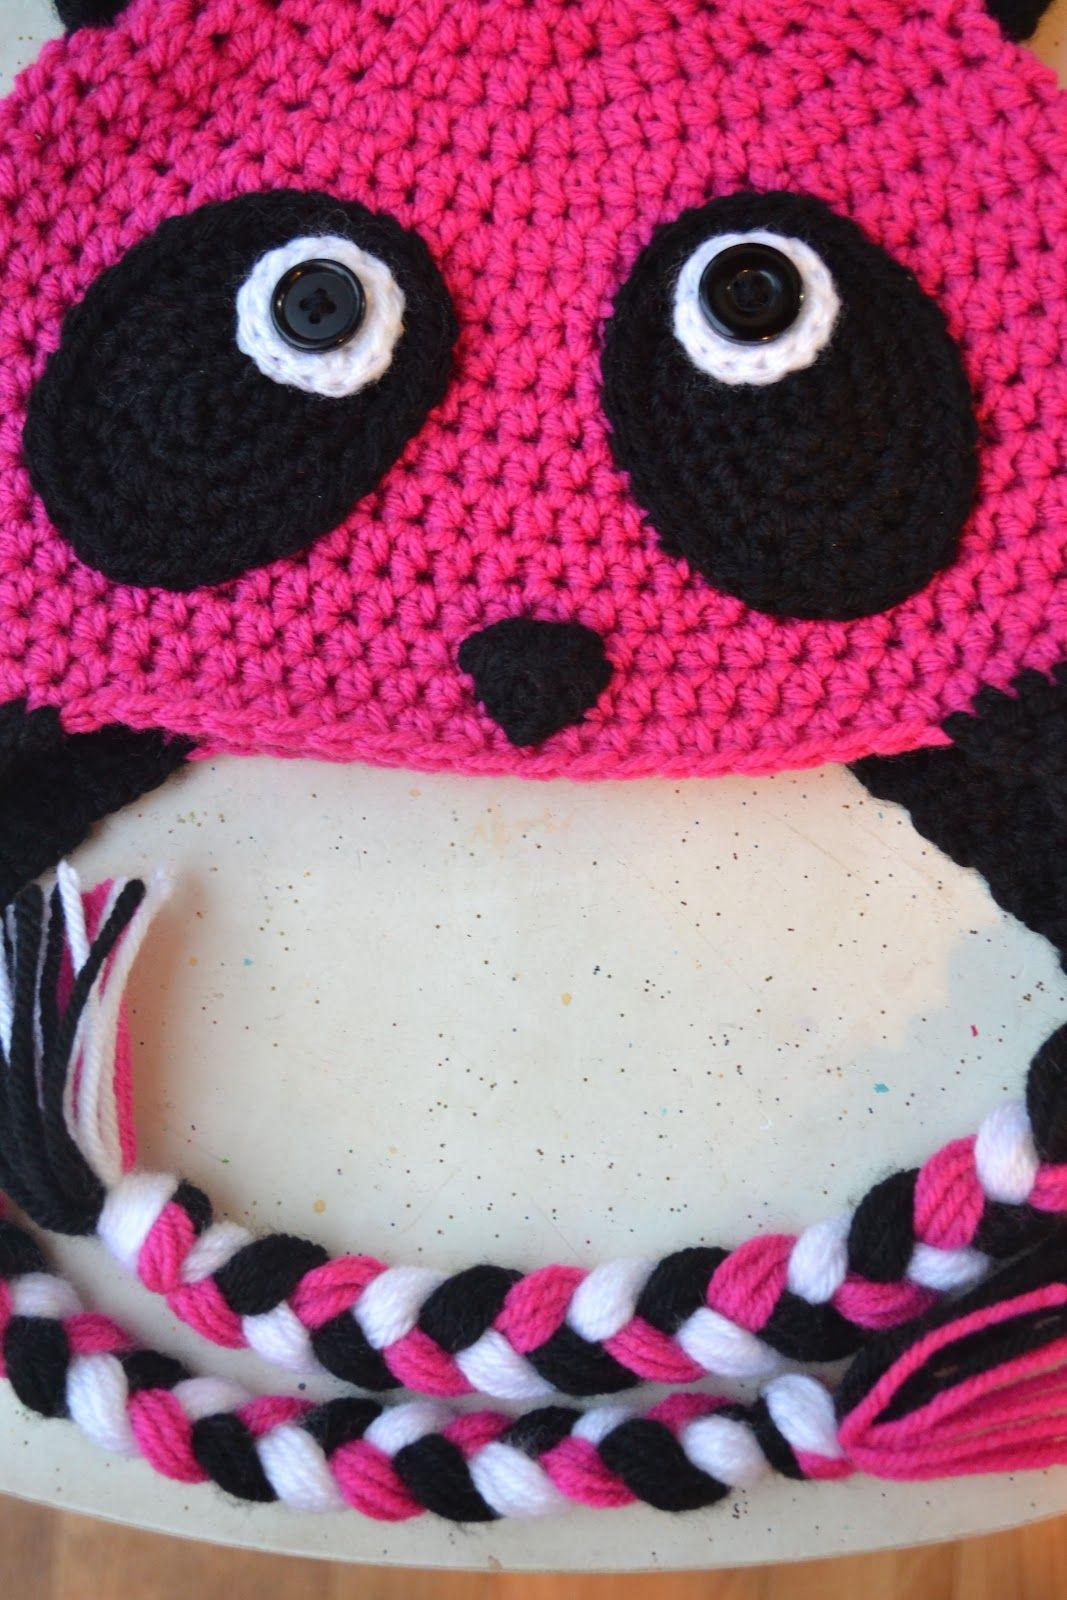 Crochet in Color: The Pink Panda | Crochet | Pinterest | Gorros ...